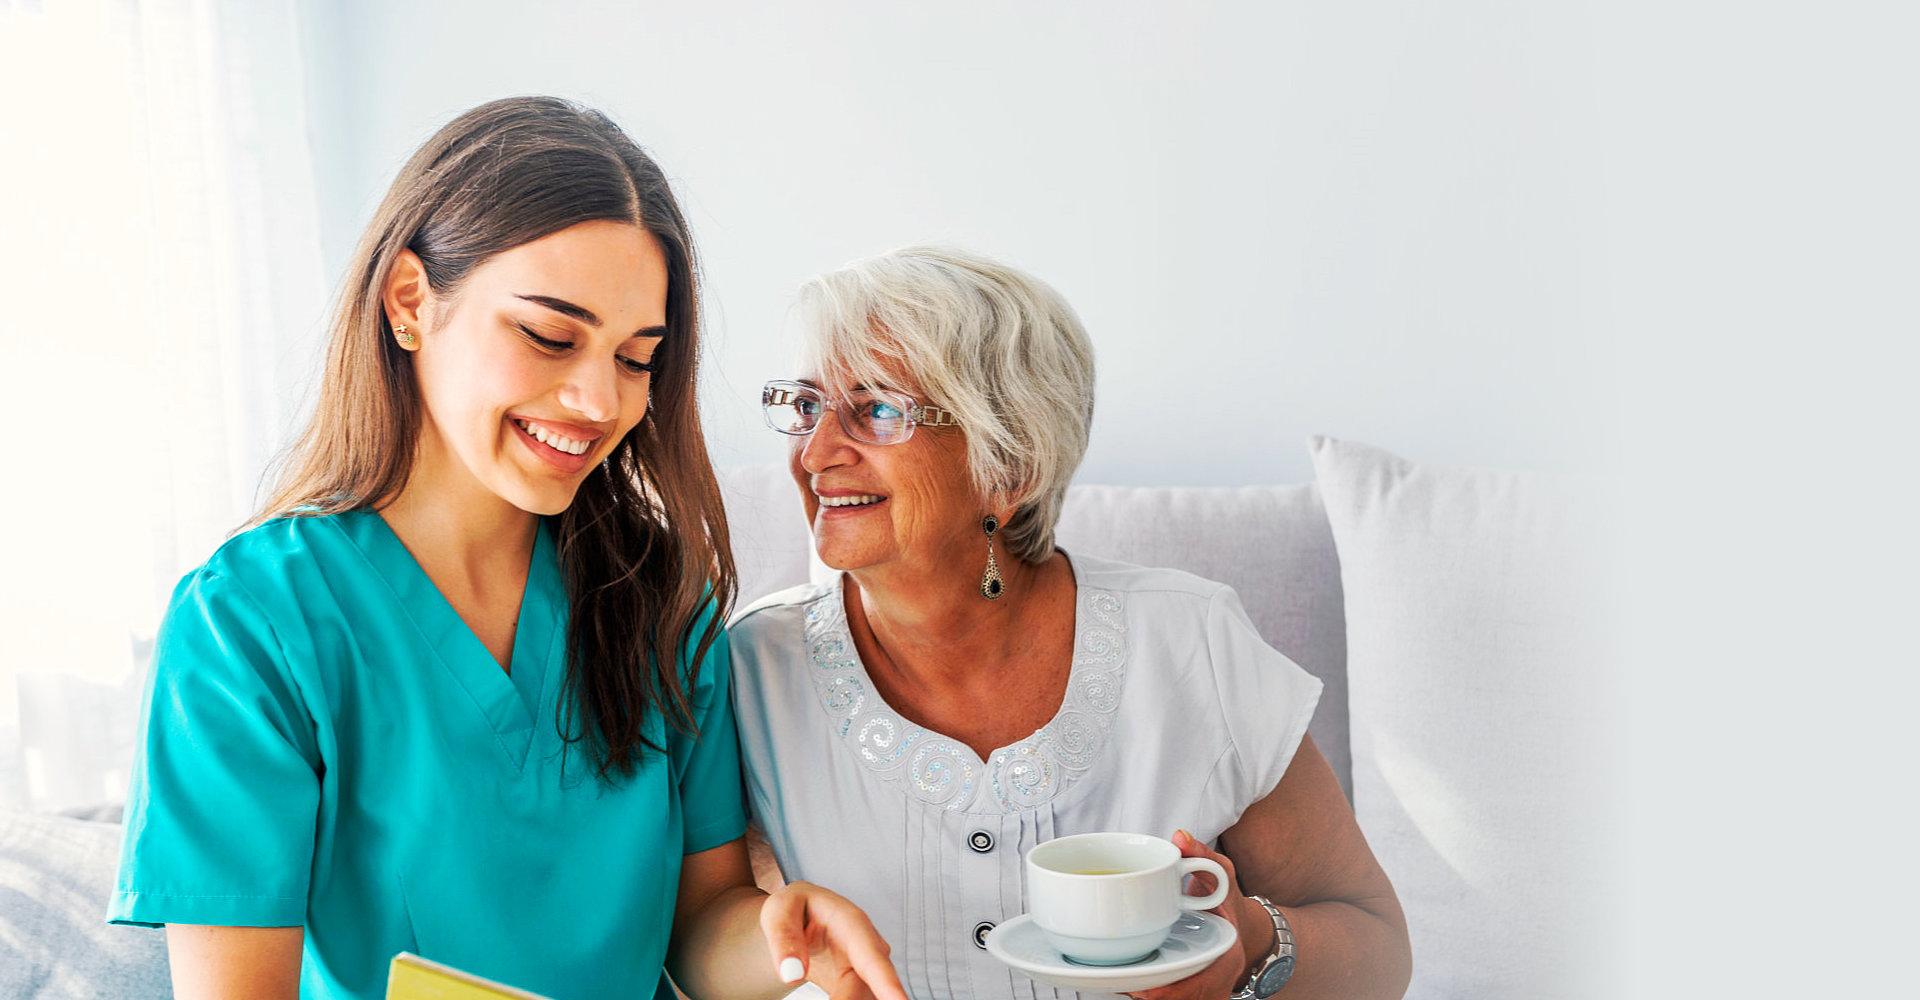 caregiver and a senior woman smiling